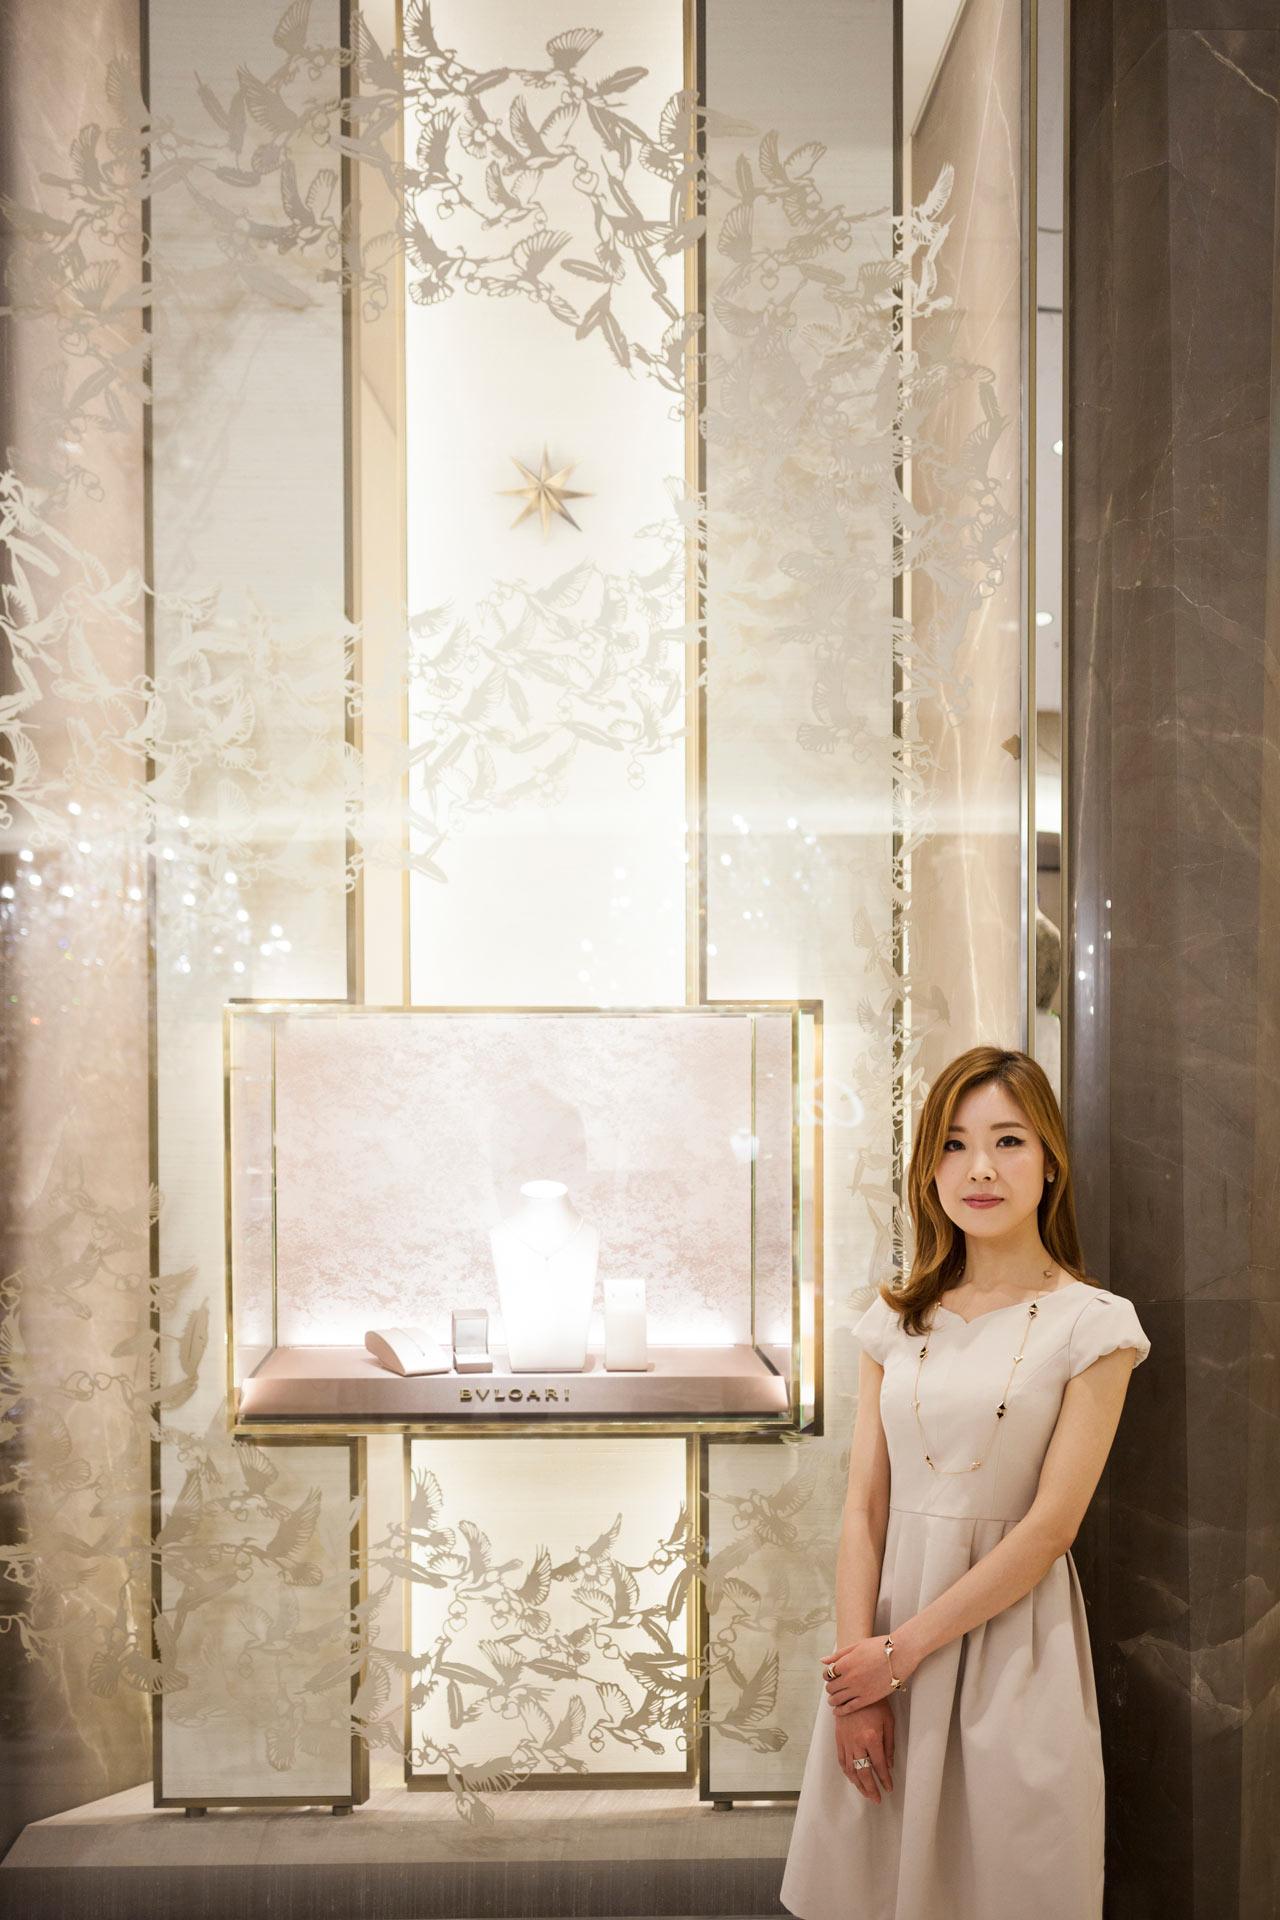 BVLGARI Bridal Art Nahoko Kojima Japanese Paper Cut